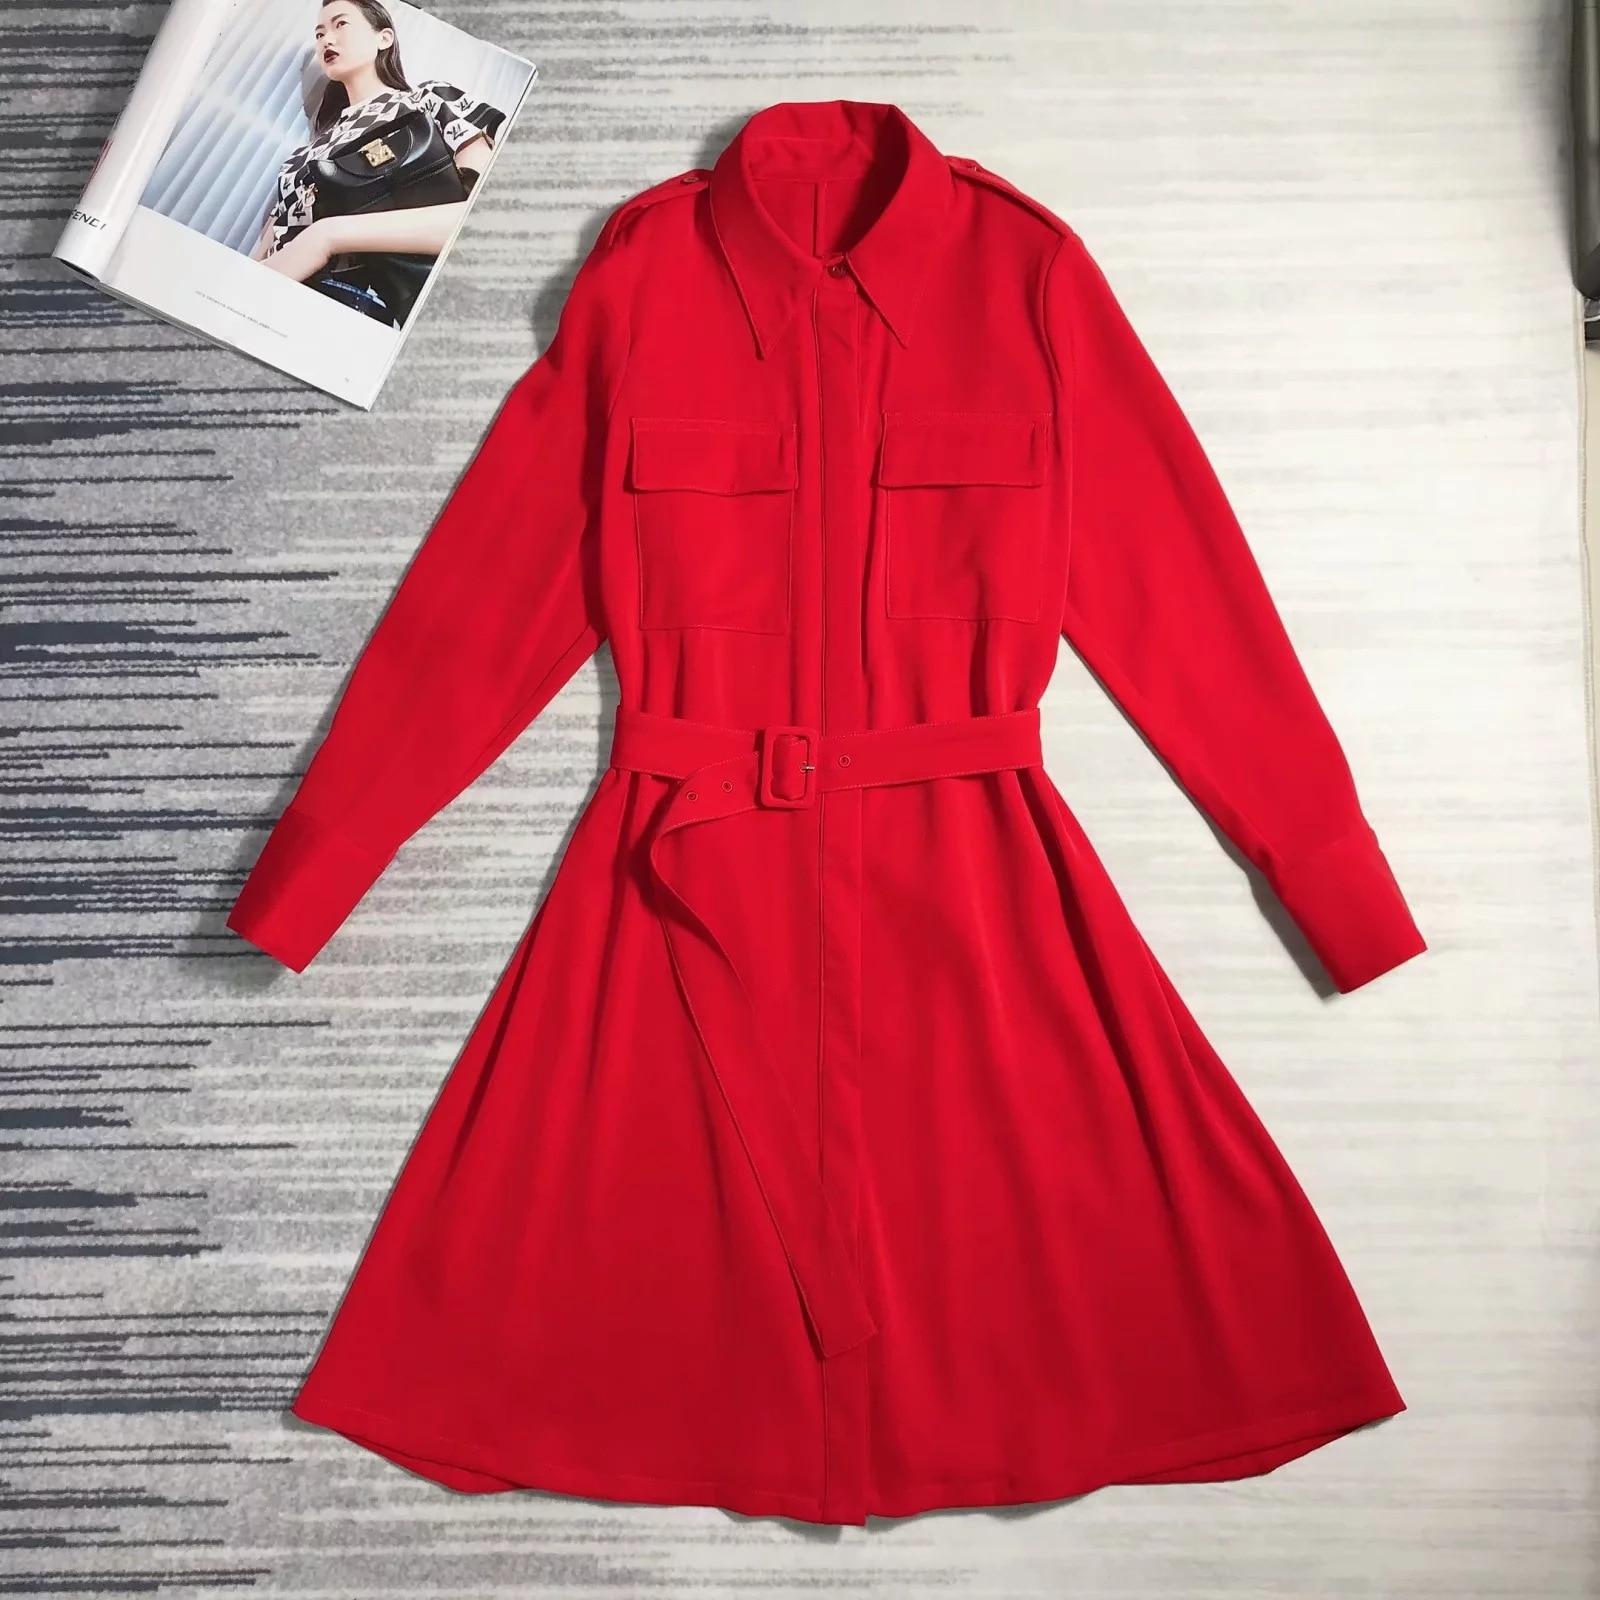 longqibao Red dress chic gentle fairy ins retro shirt dress